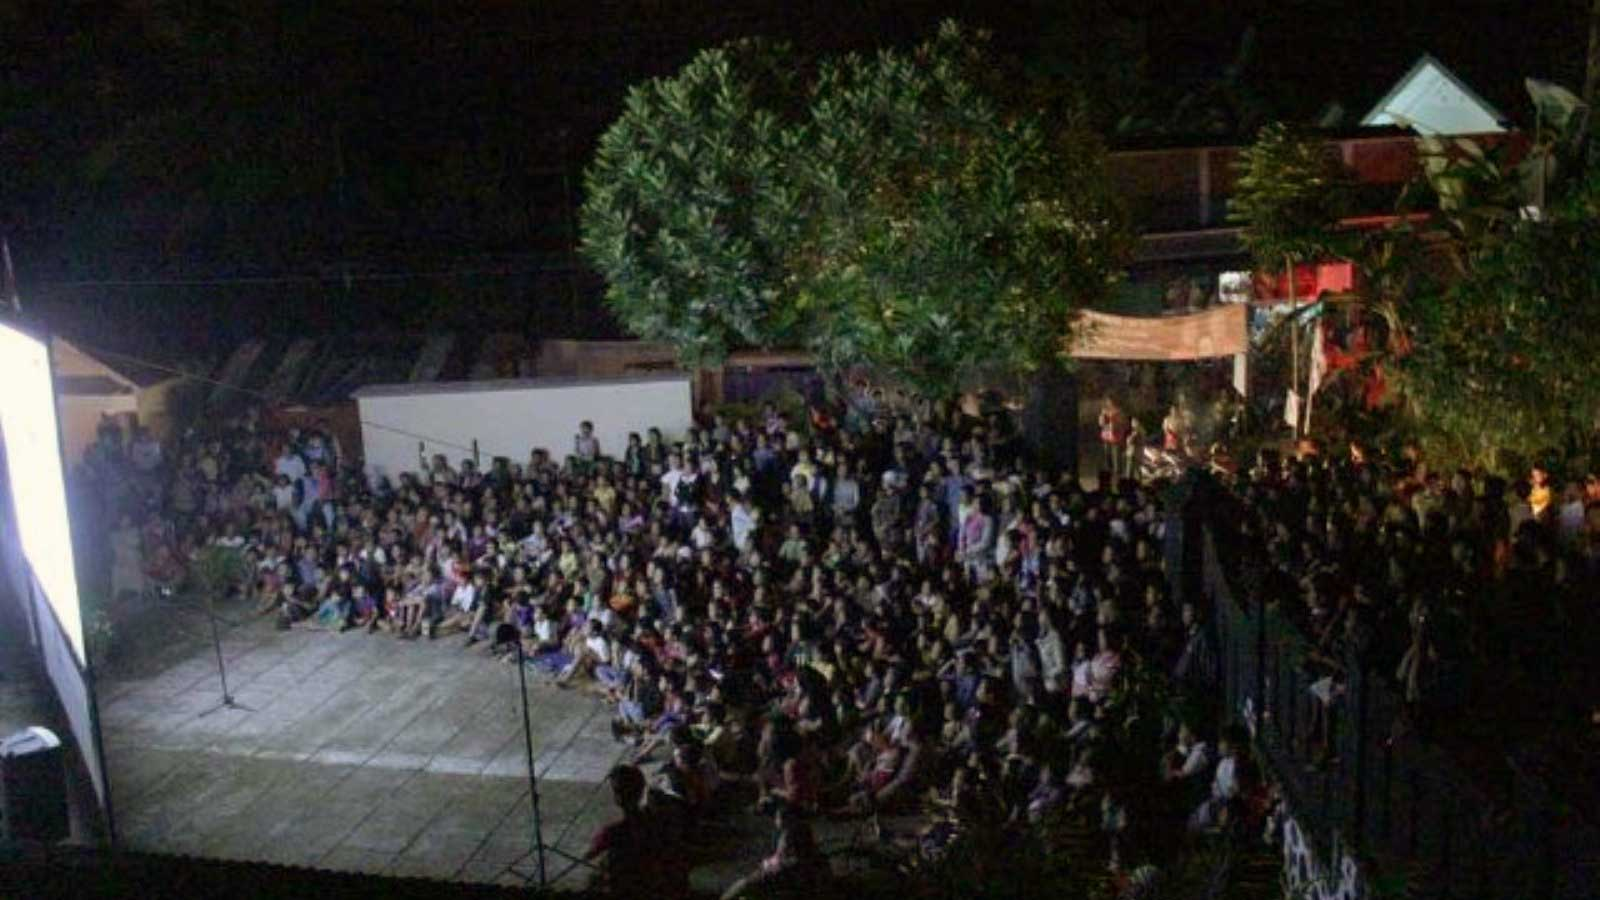 Suasana pemutaran Festival Film Purbalingga 2013 (dokumentasi penyelenggara festival)